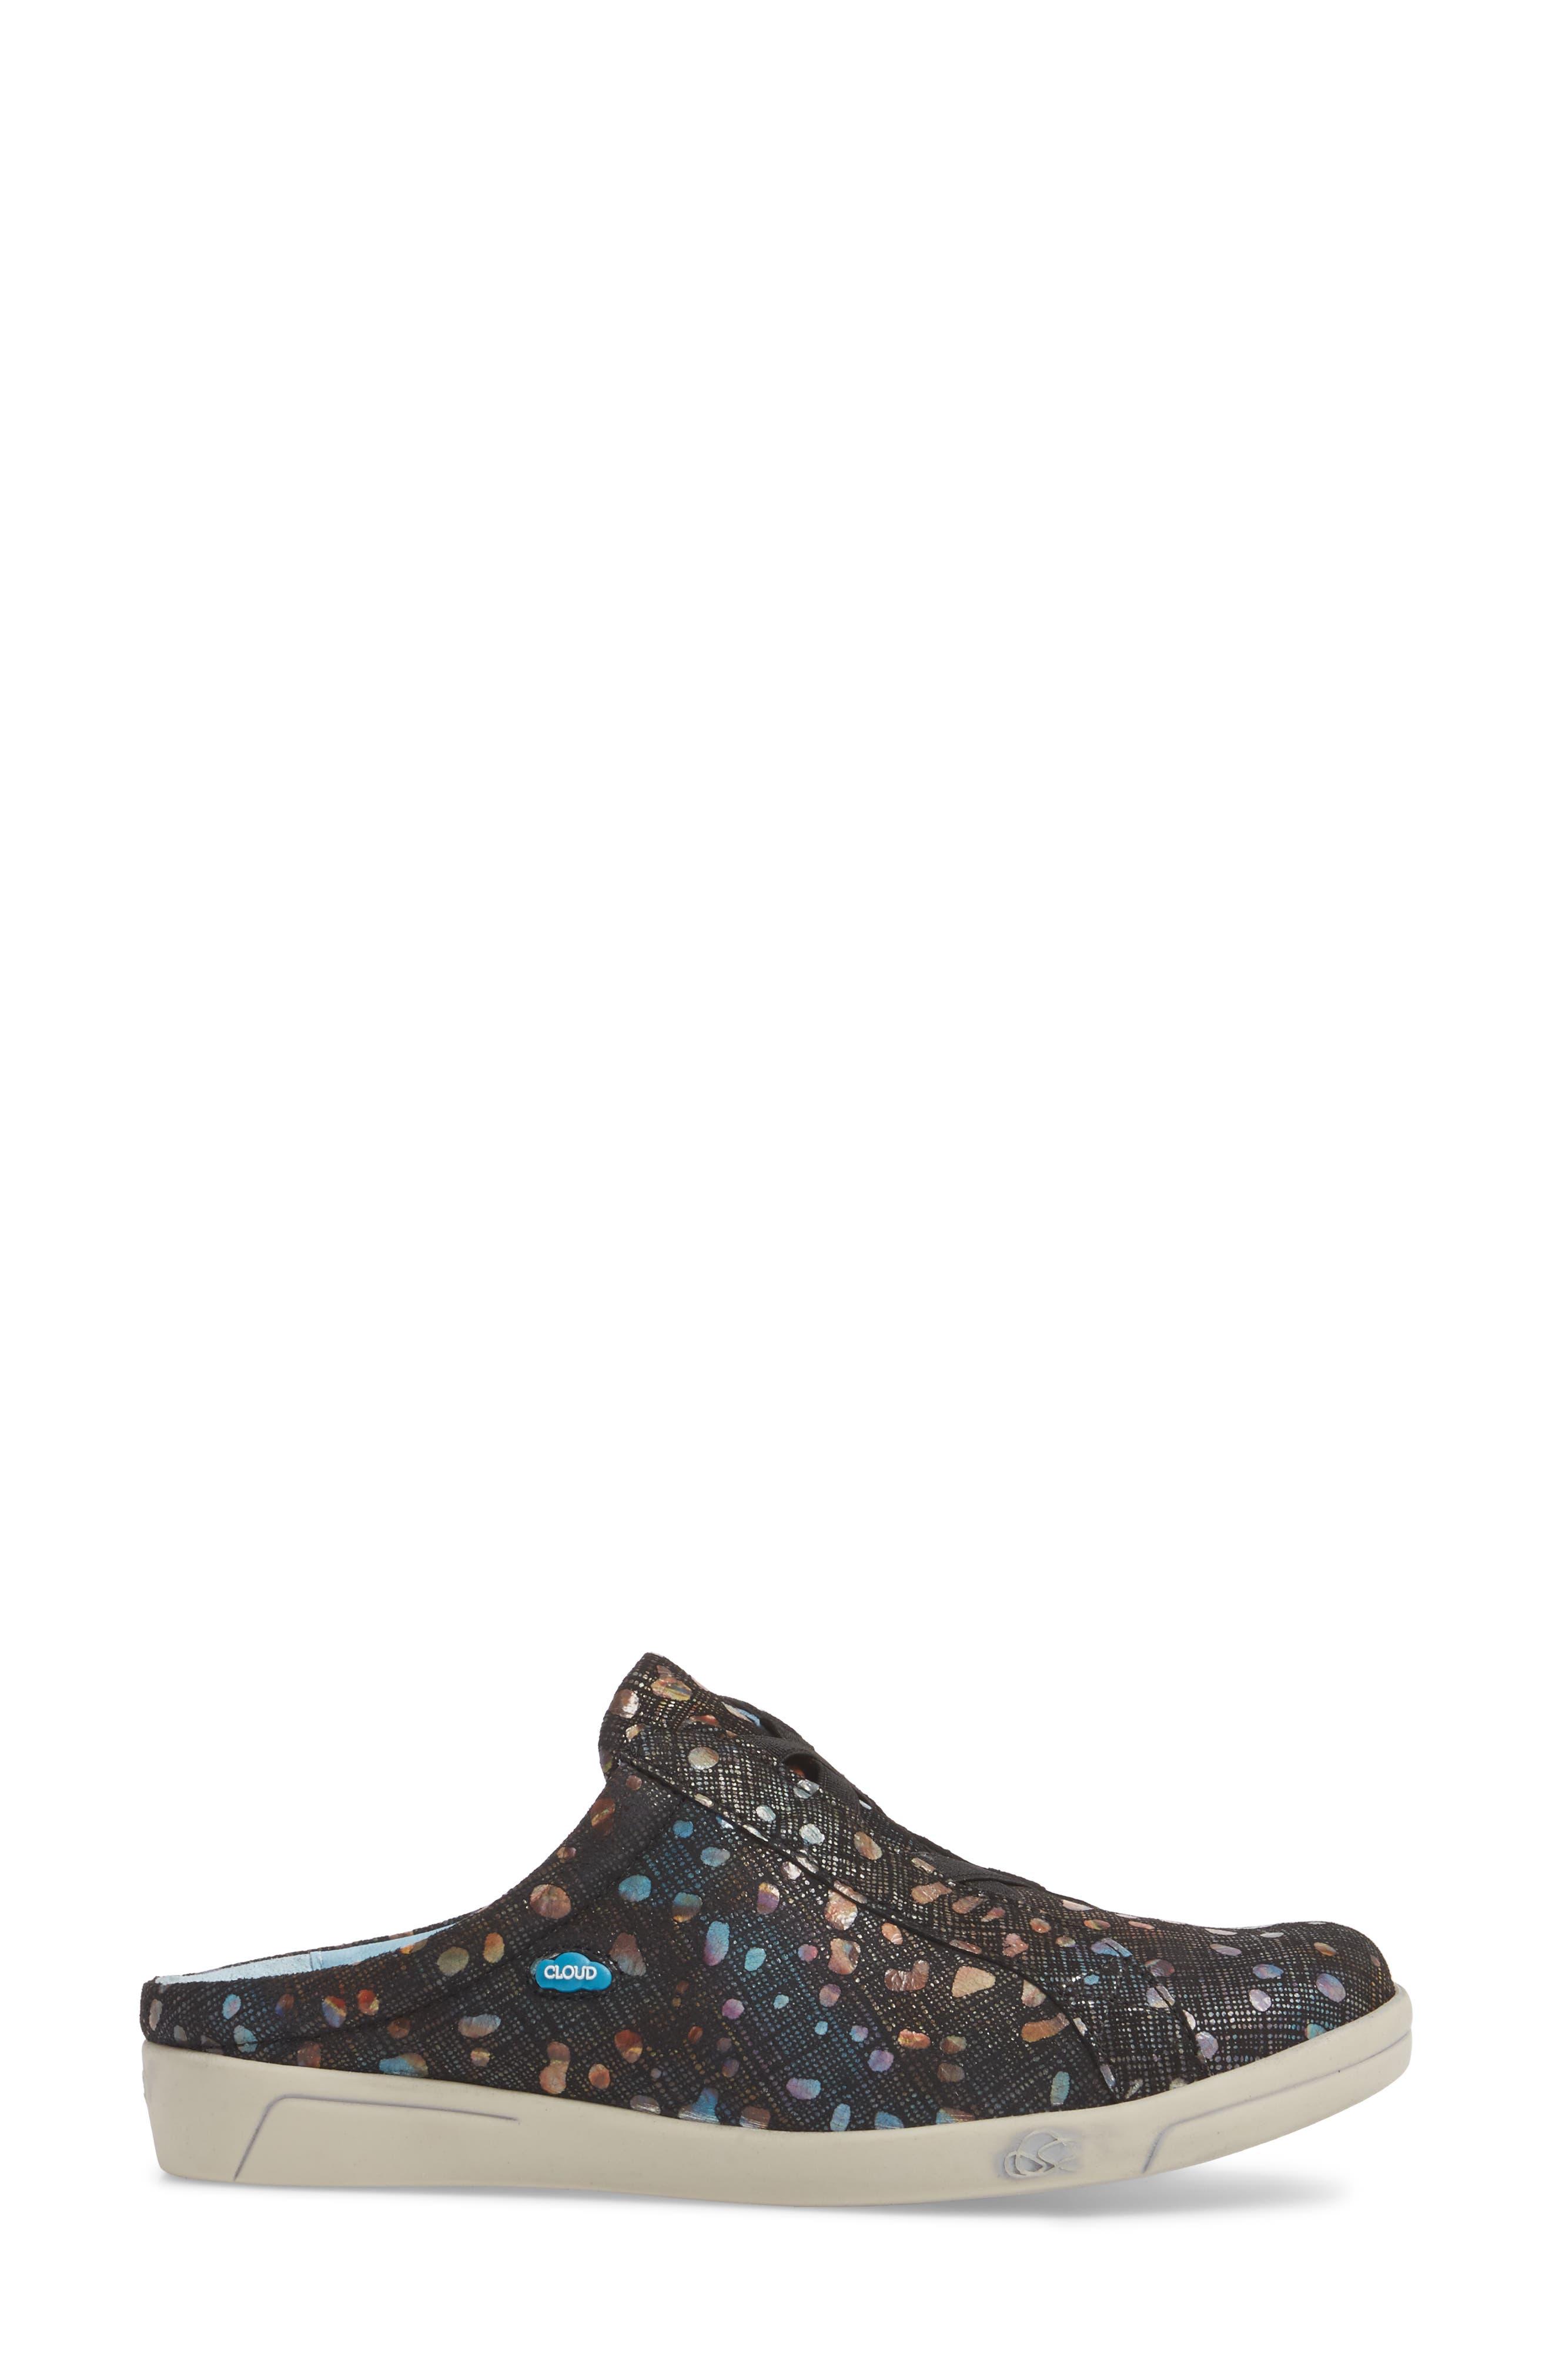 Arizona Fantasy Mule Sneaker,                             Alternate thumbnail 3, color,                             Bubble Leather